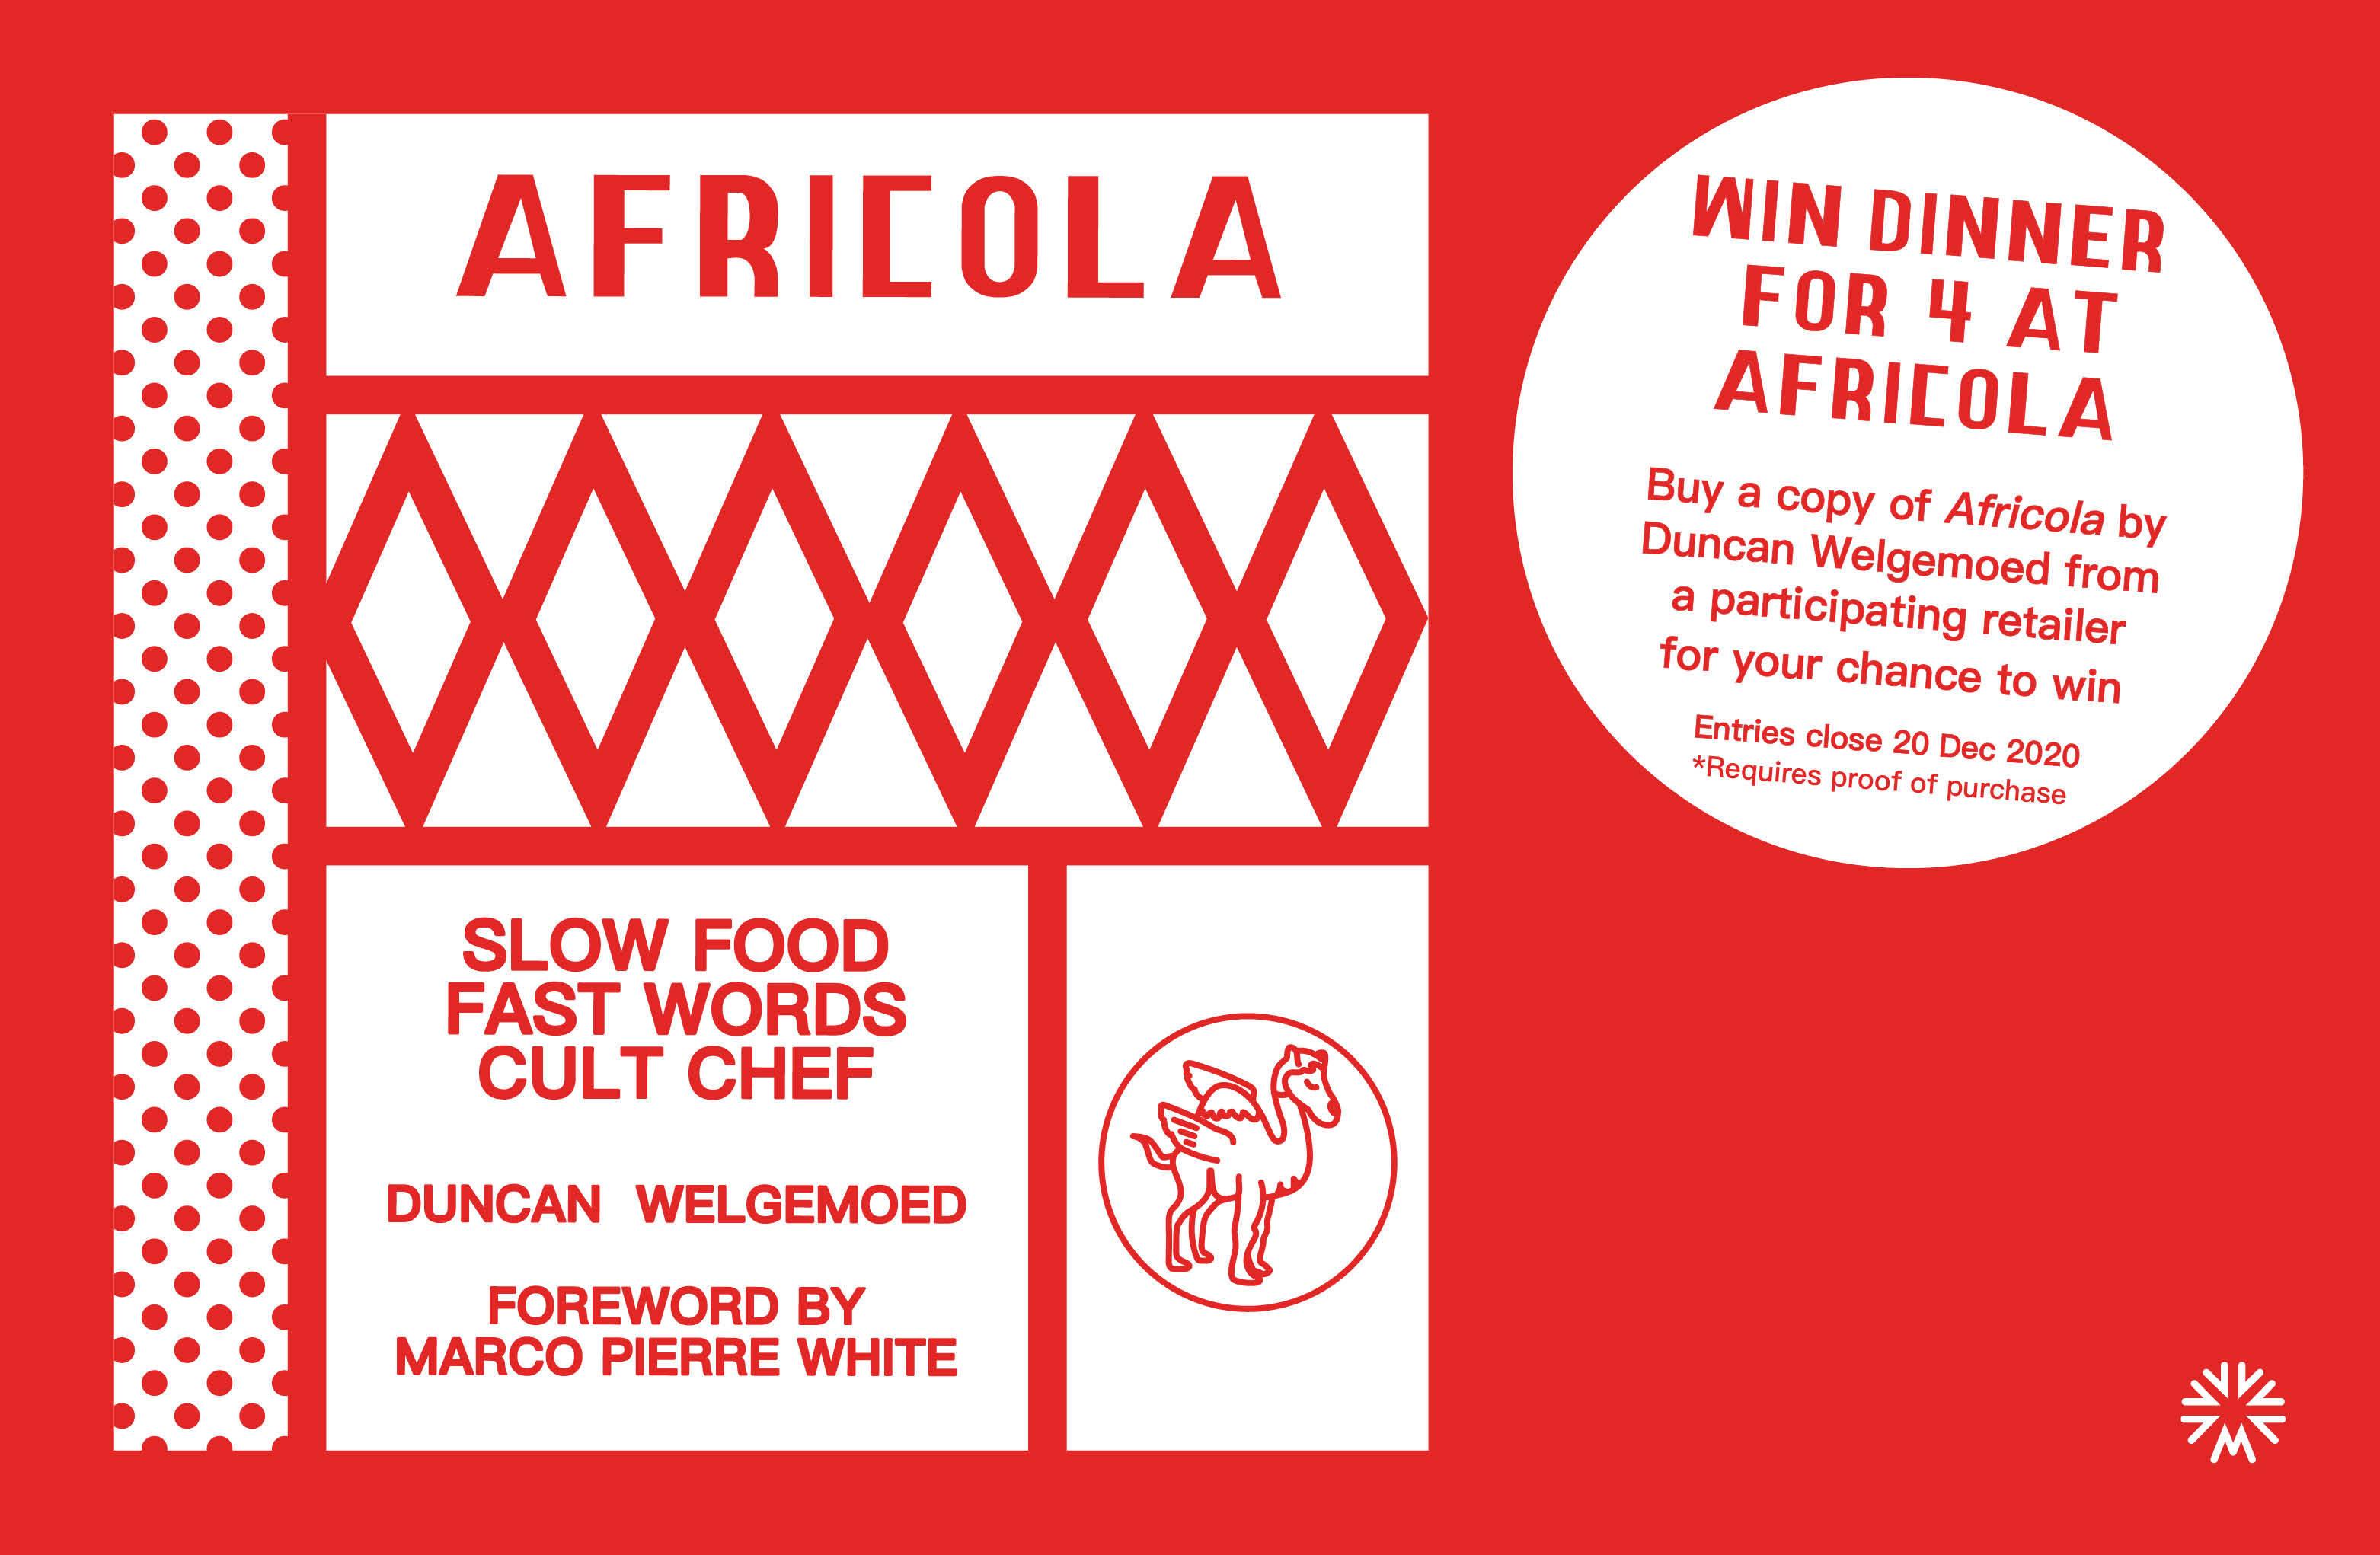 Africola by Duncan Welgemoed